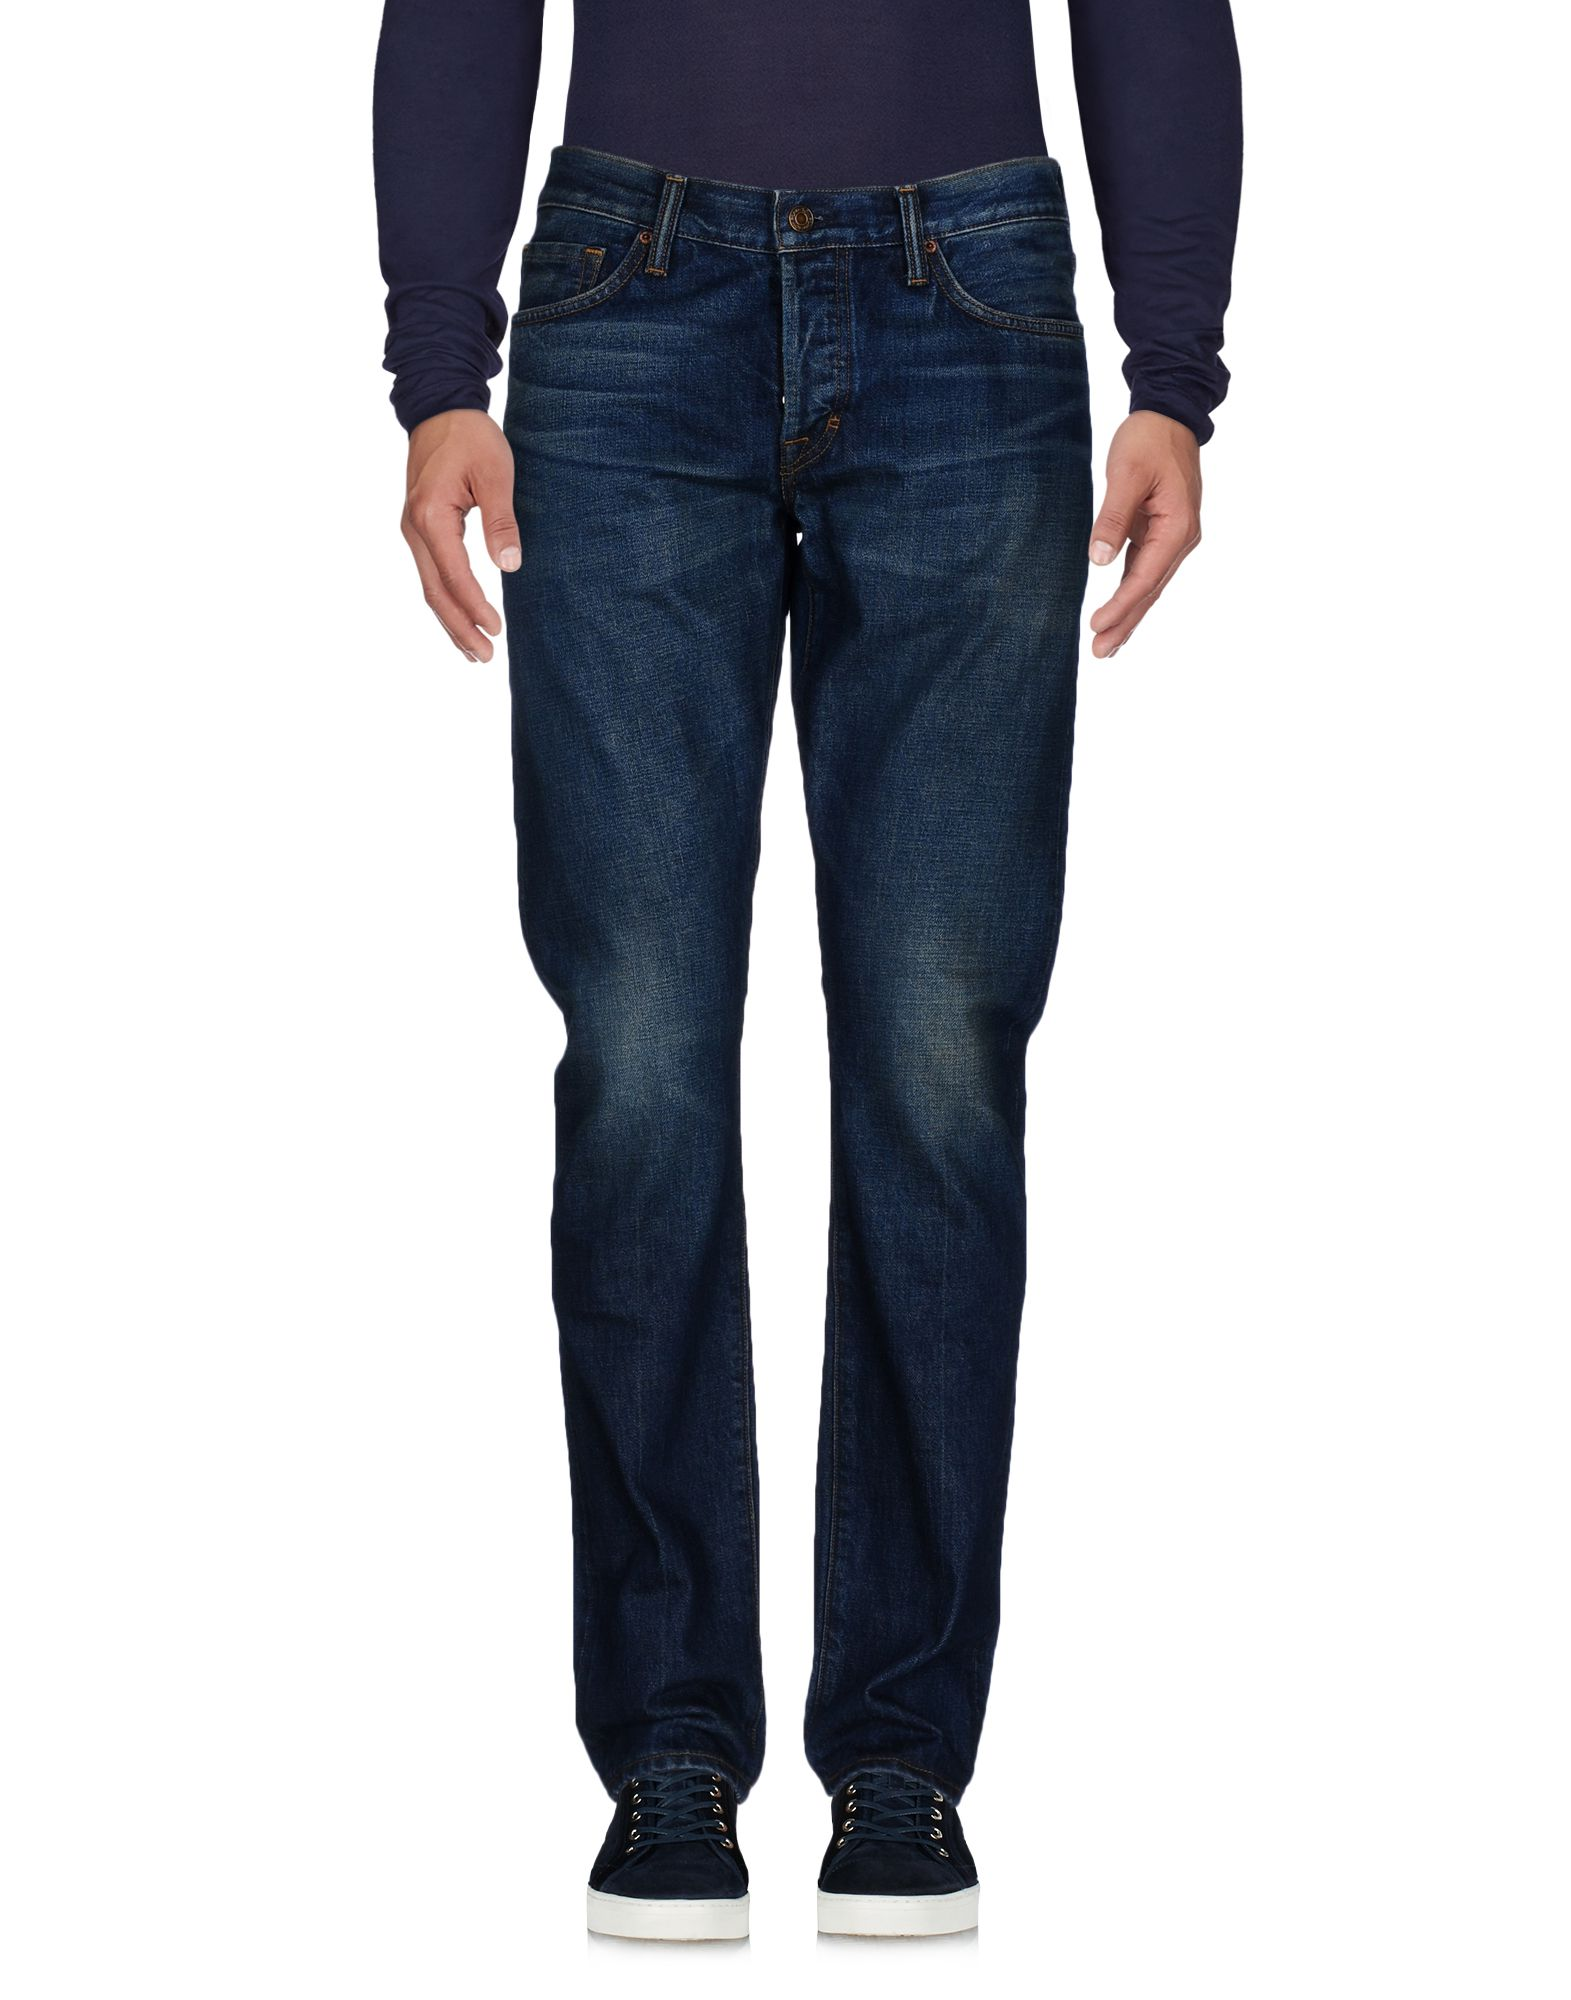 Pantaloni Jeans Tom Ford Donna - Acquista online su